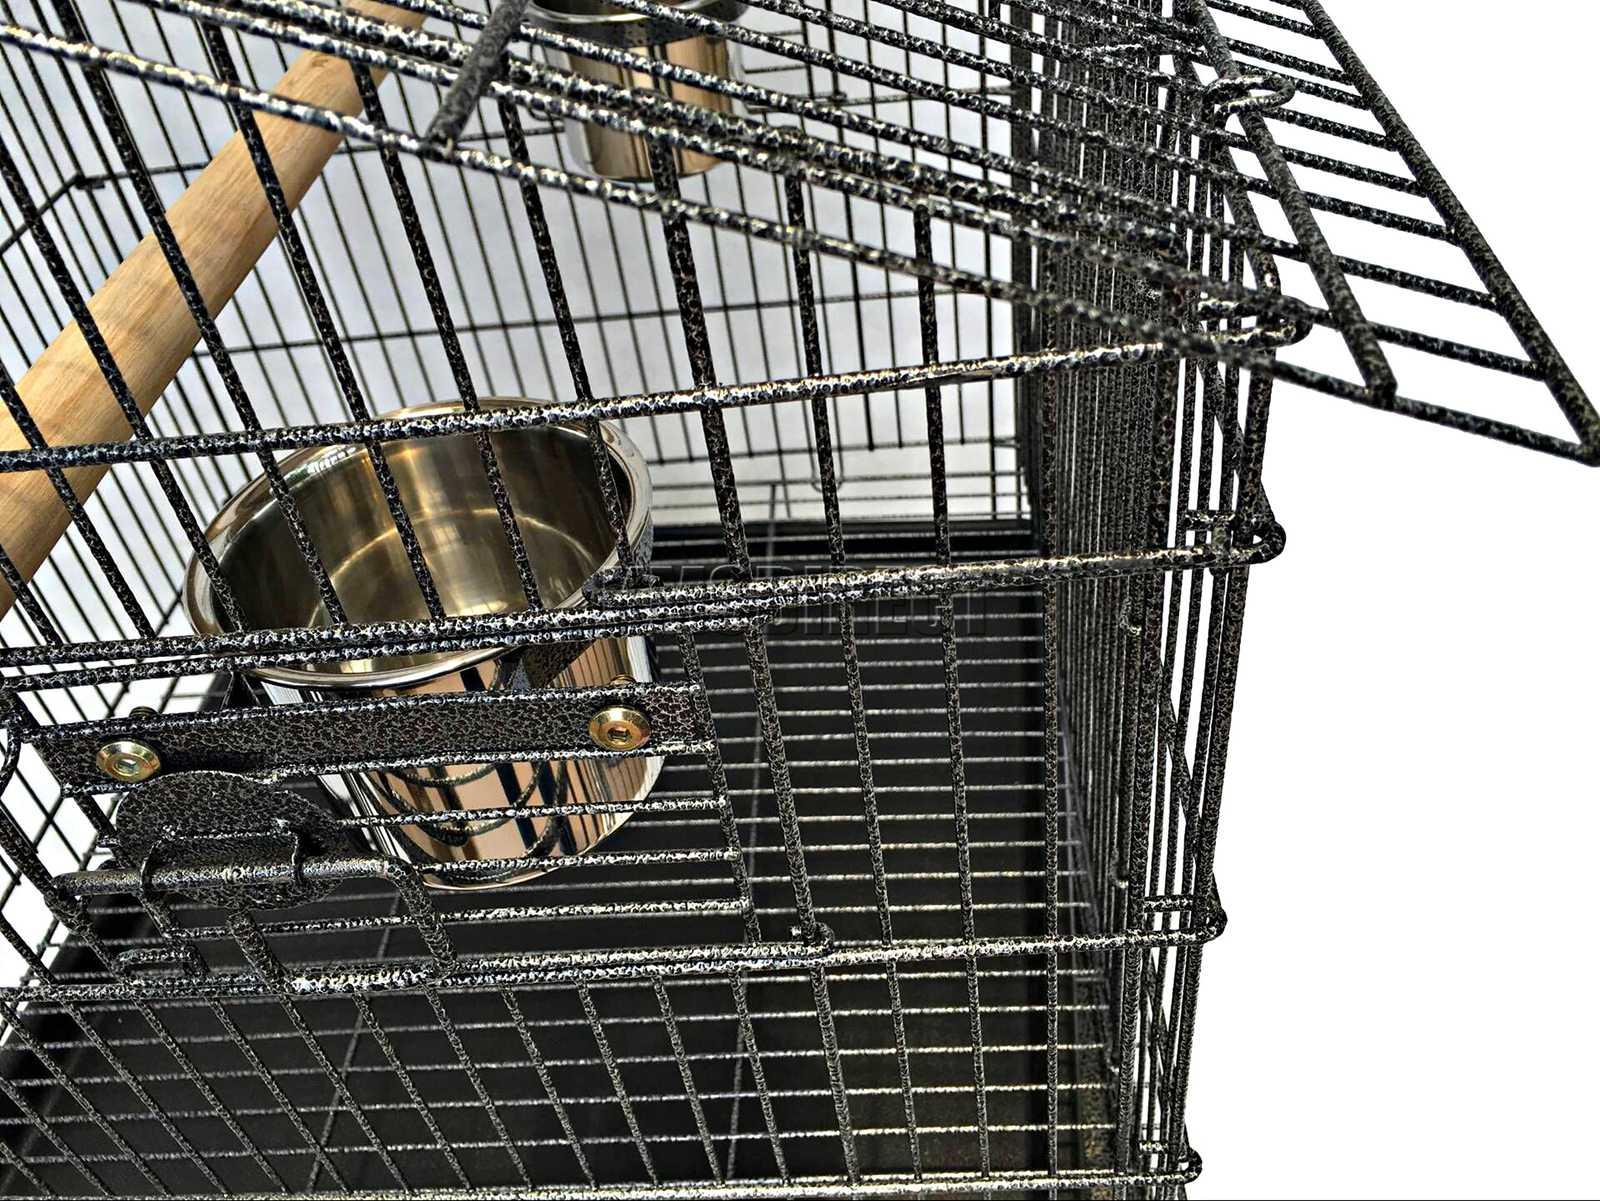 121998112507 2475 I 225 30 BIRD CAGE METAL MBC 02 HAMMERED SILVER KMSWM0605 - Foxhunter Grande Metal Jaula con Soporte Pajarera Loro Periquito Canario Cacatua